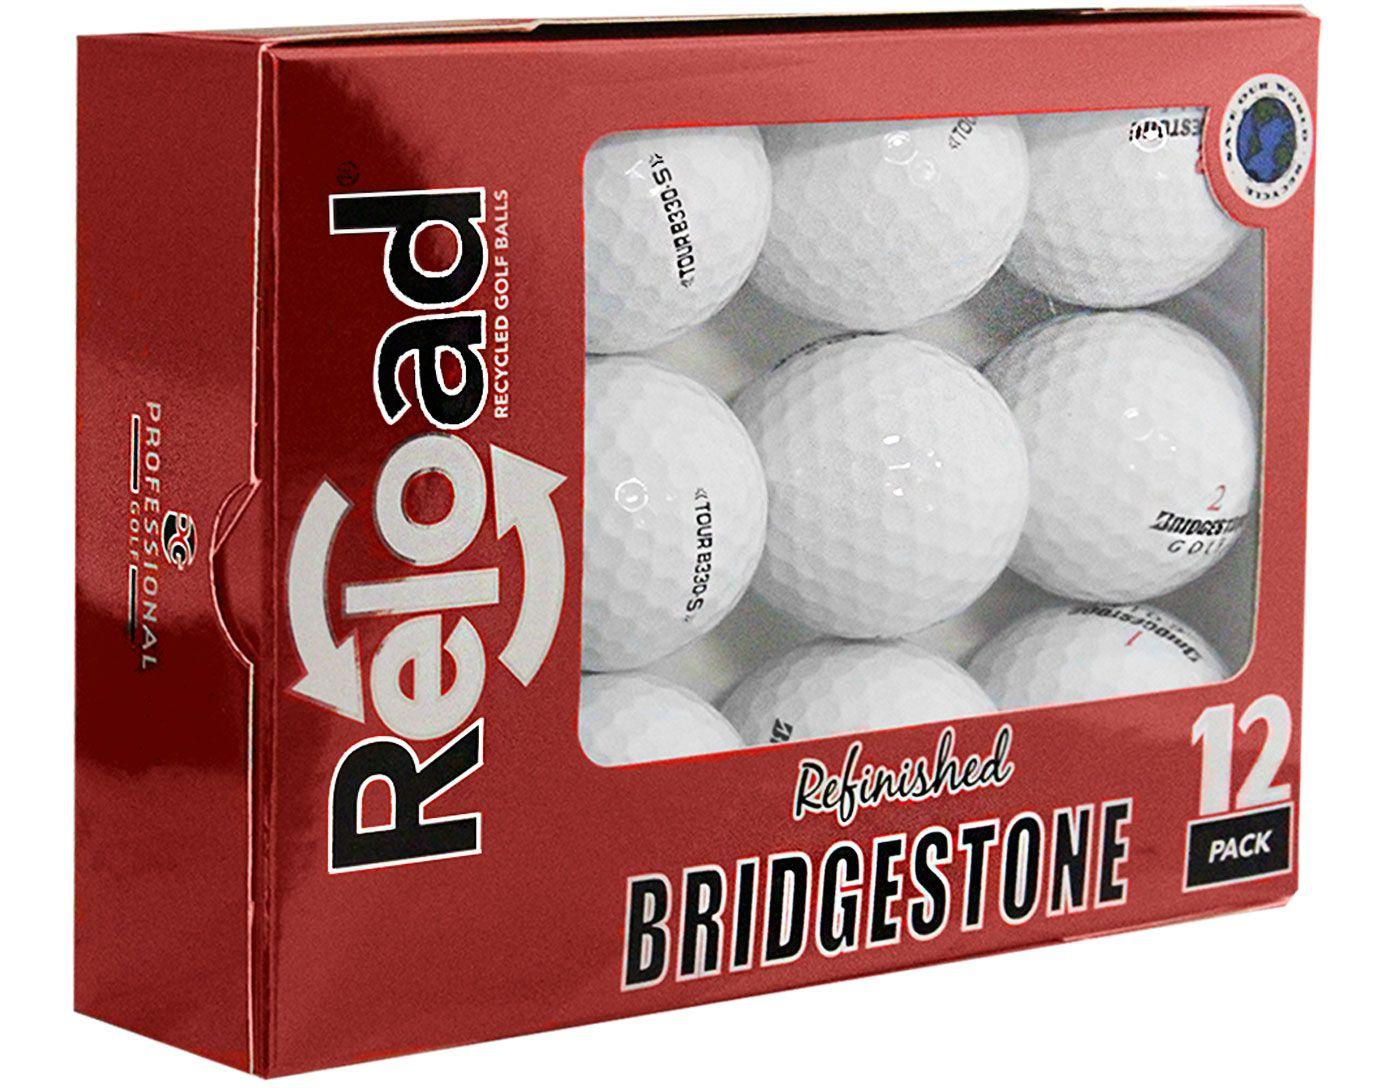 Refurbished Bridgestone Tour B330-S Golf Balls